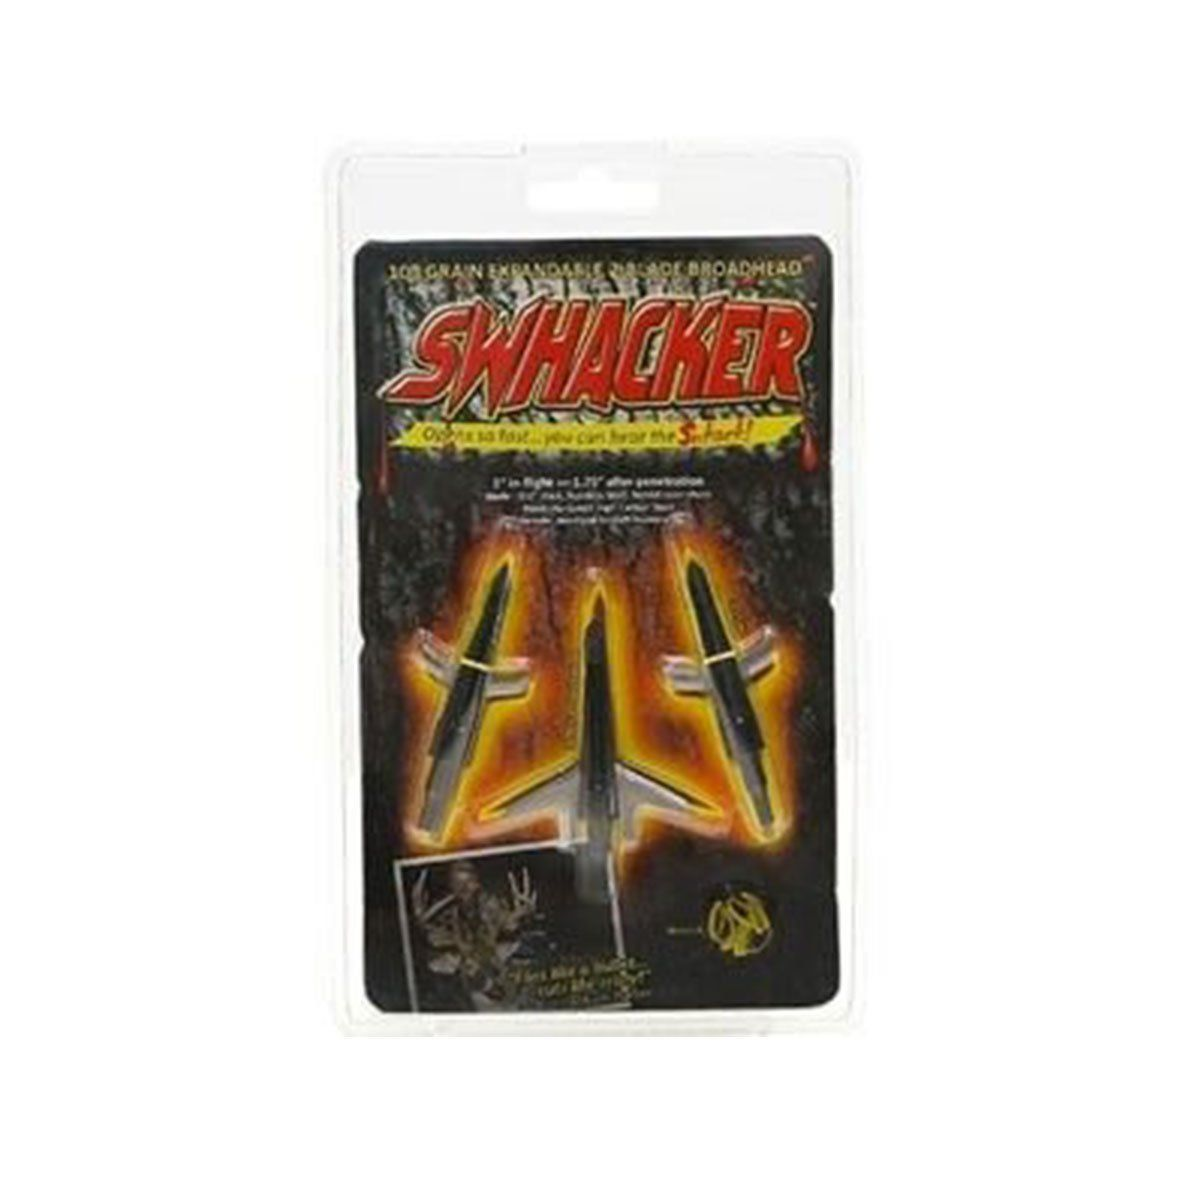 Kit 3 Ponteiras p/ flecha Swhacker Rosqueavel Metal